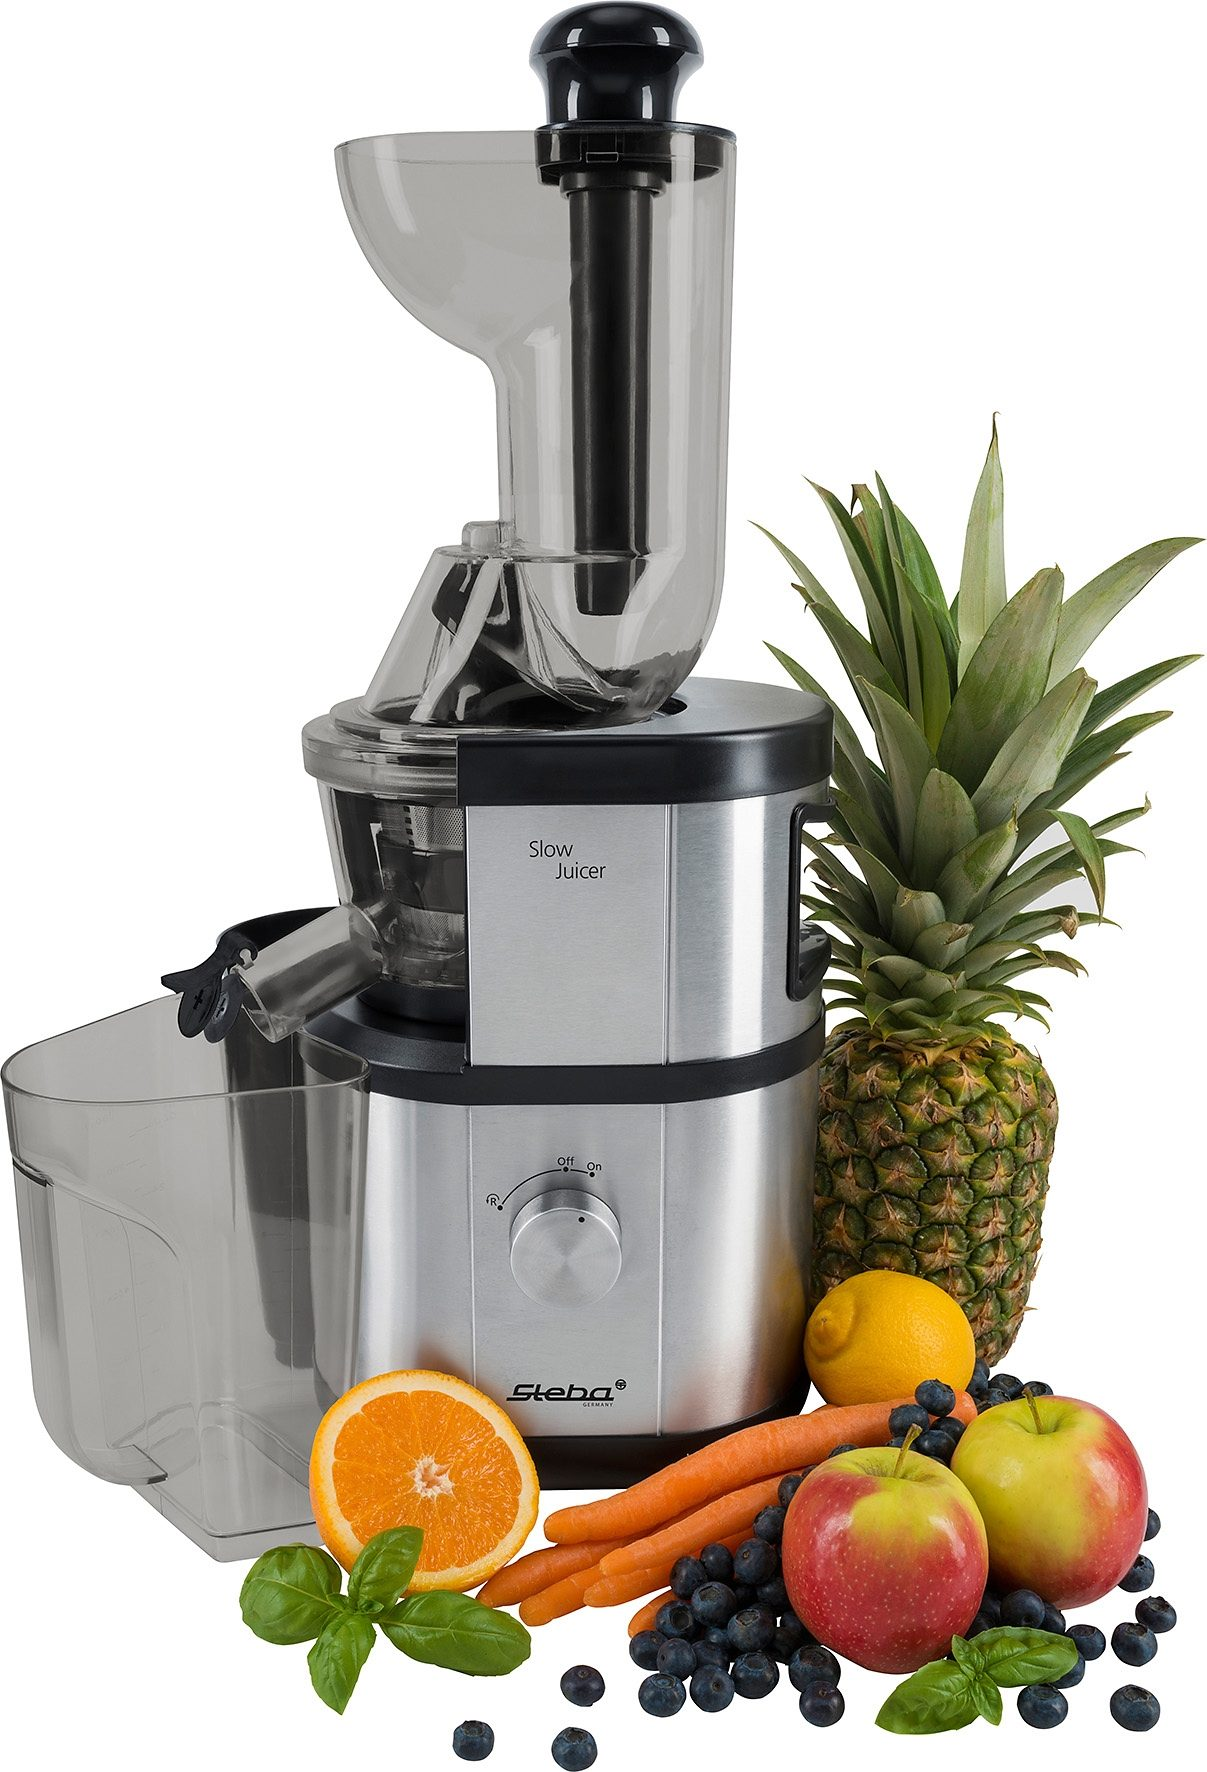 Steba Slow-Juicer E 400, schonend kaltes Pressverfahren, 400 Watt